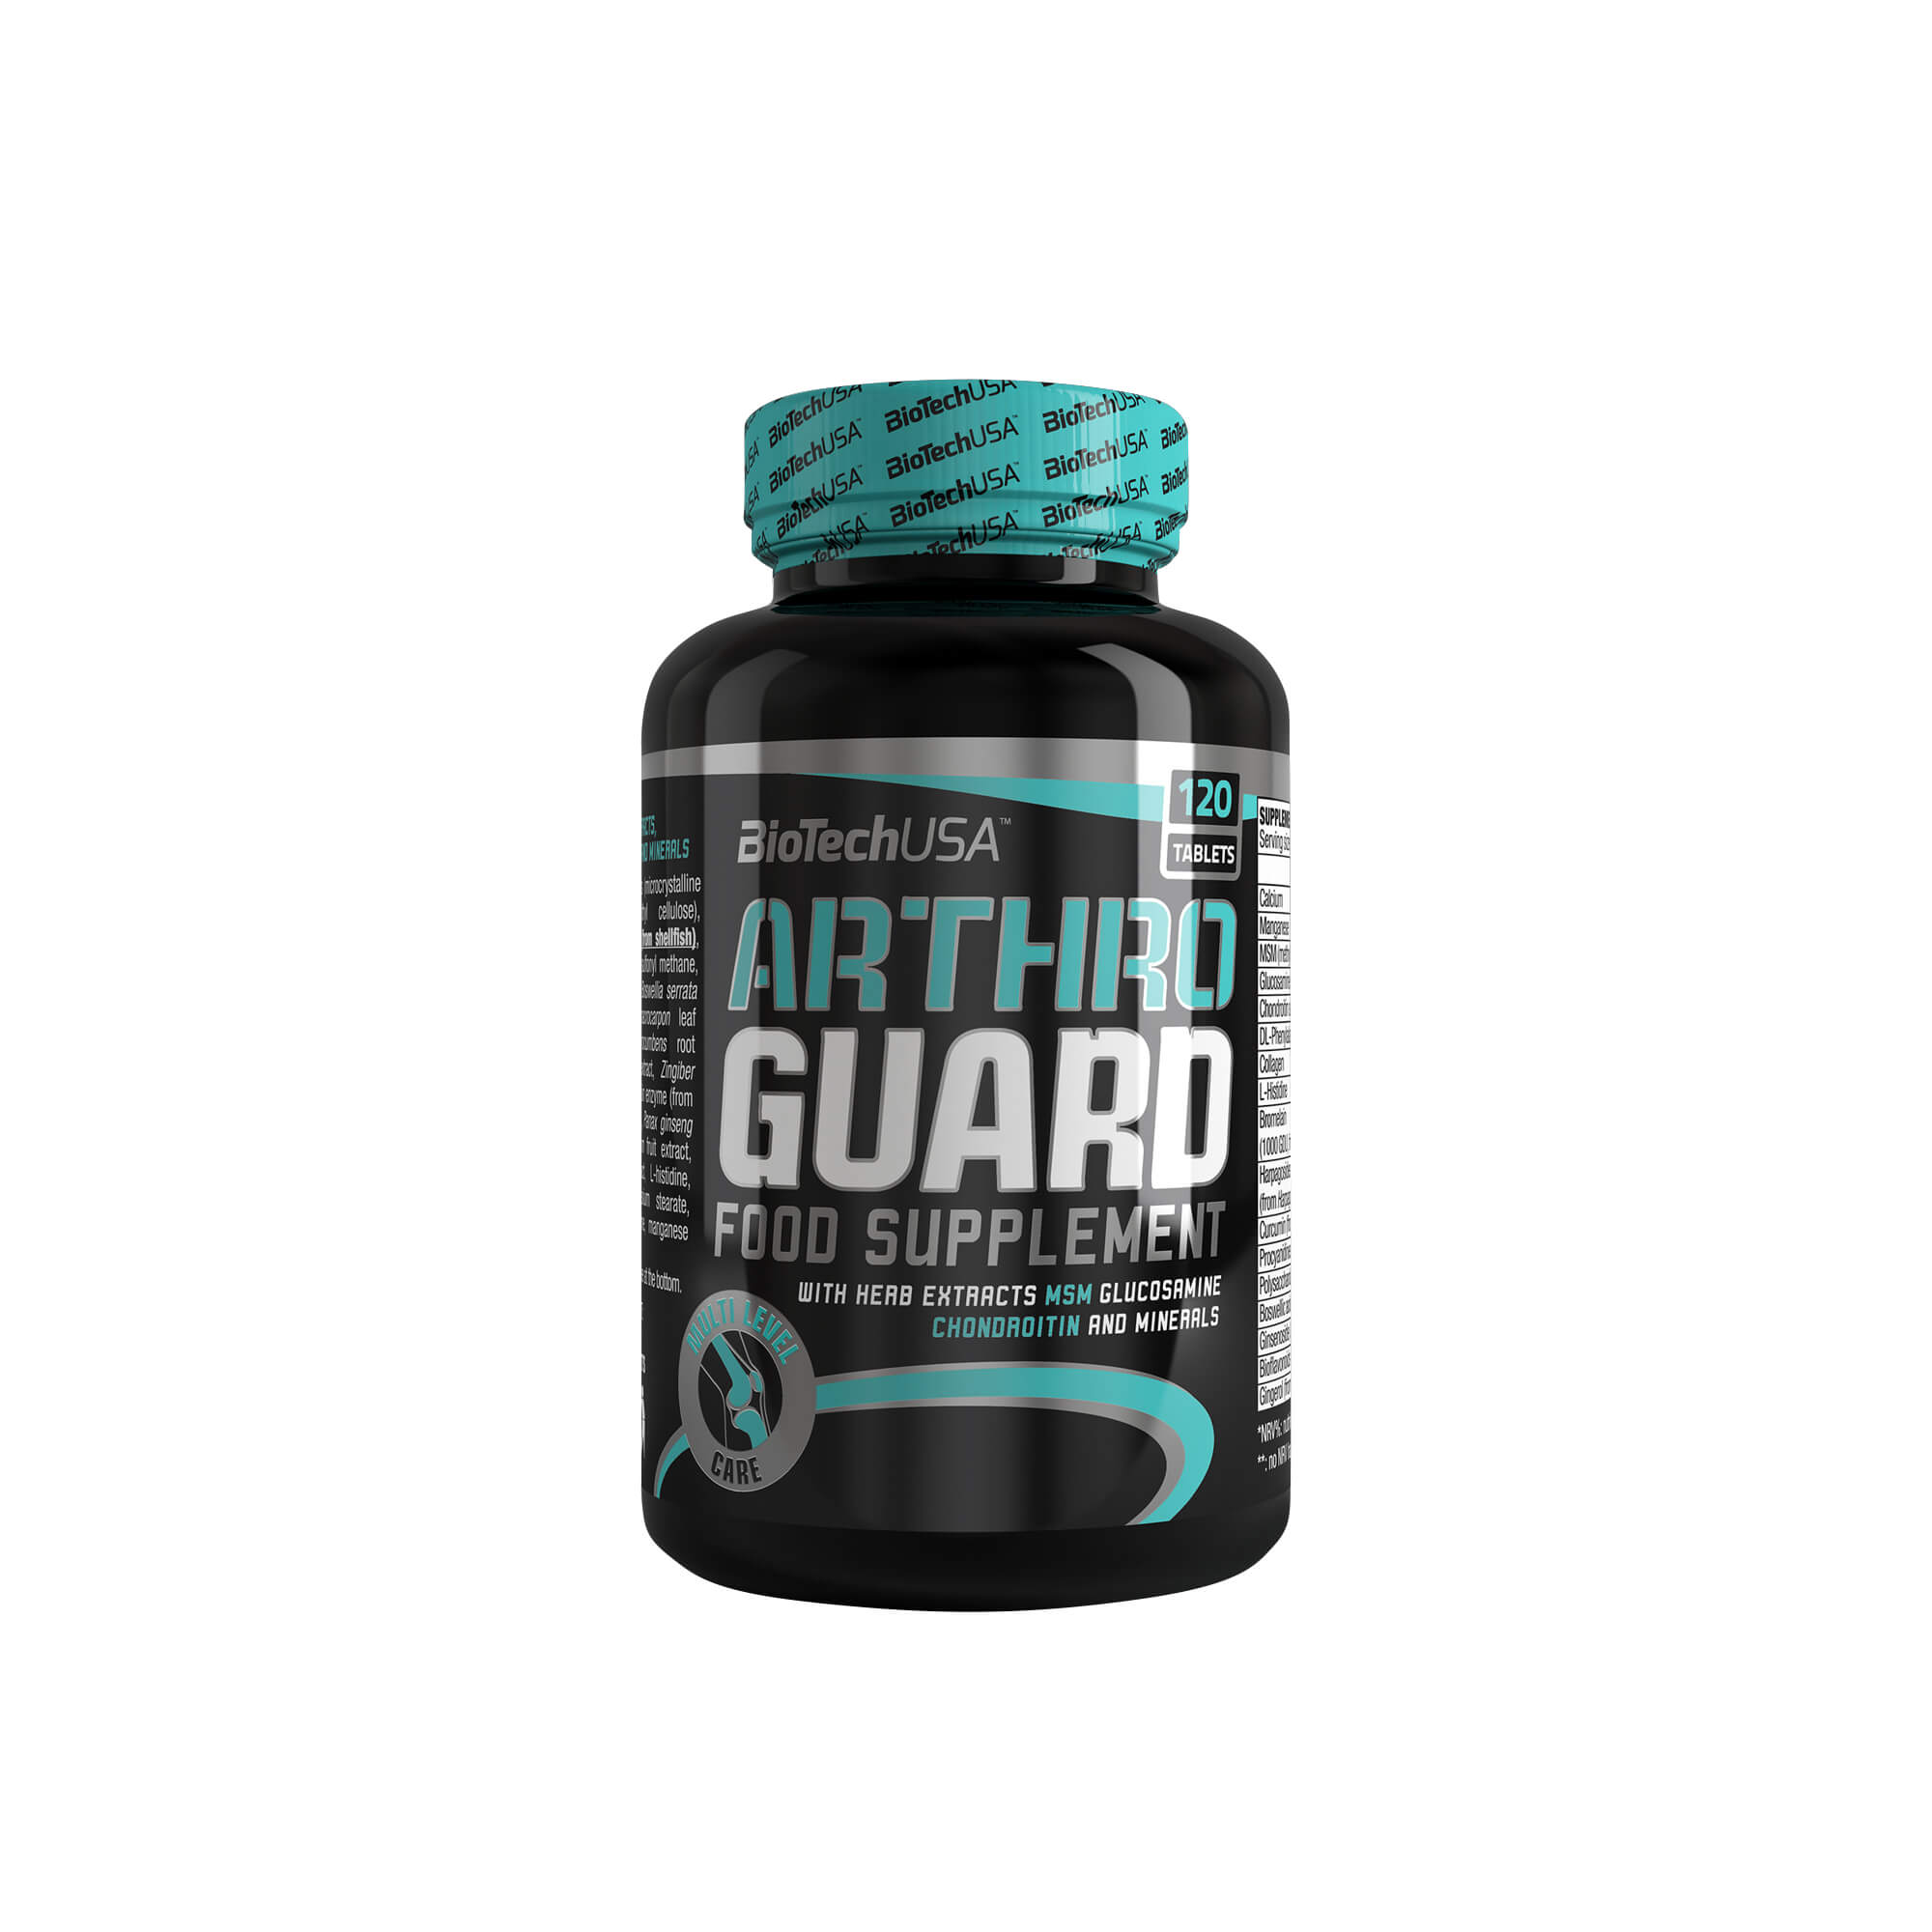 Arthro Guard imagine